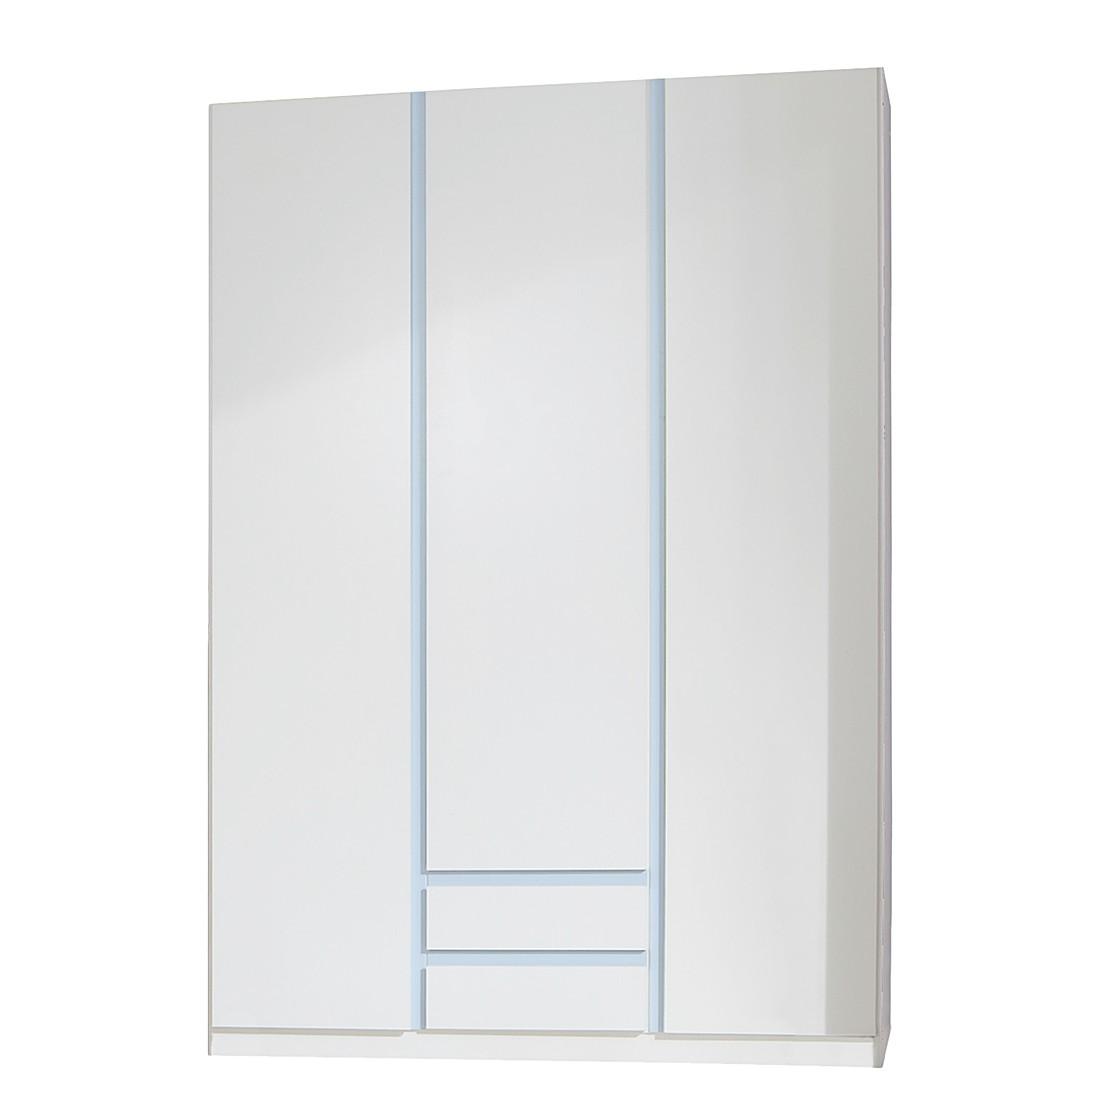 Armoire à vêtements Bibo II - Blanc alpin / Bleu glacé, Wimex